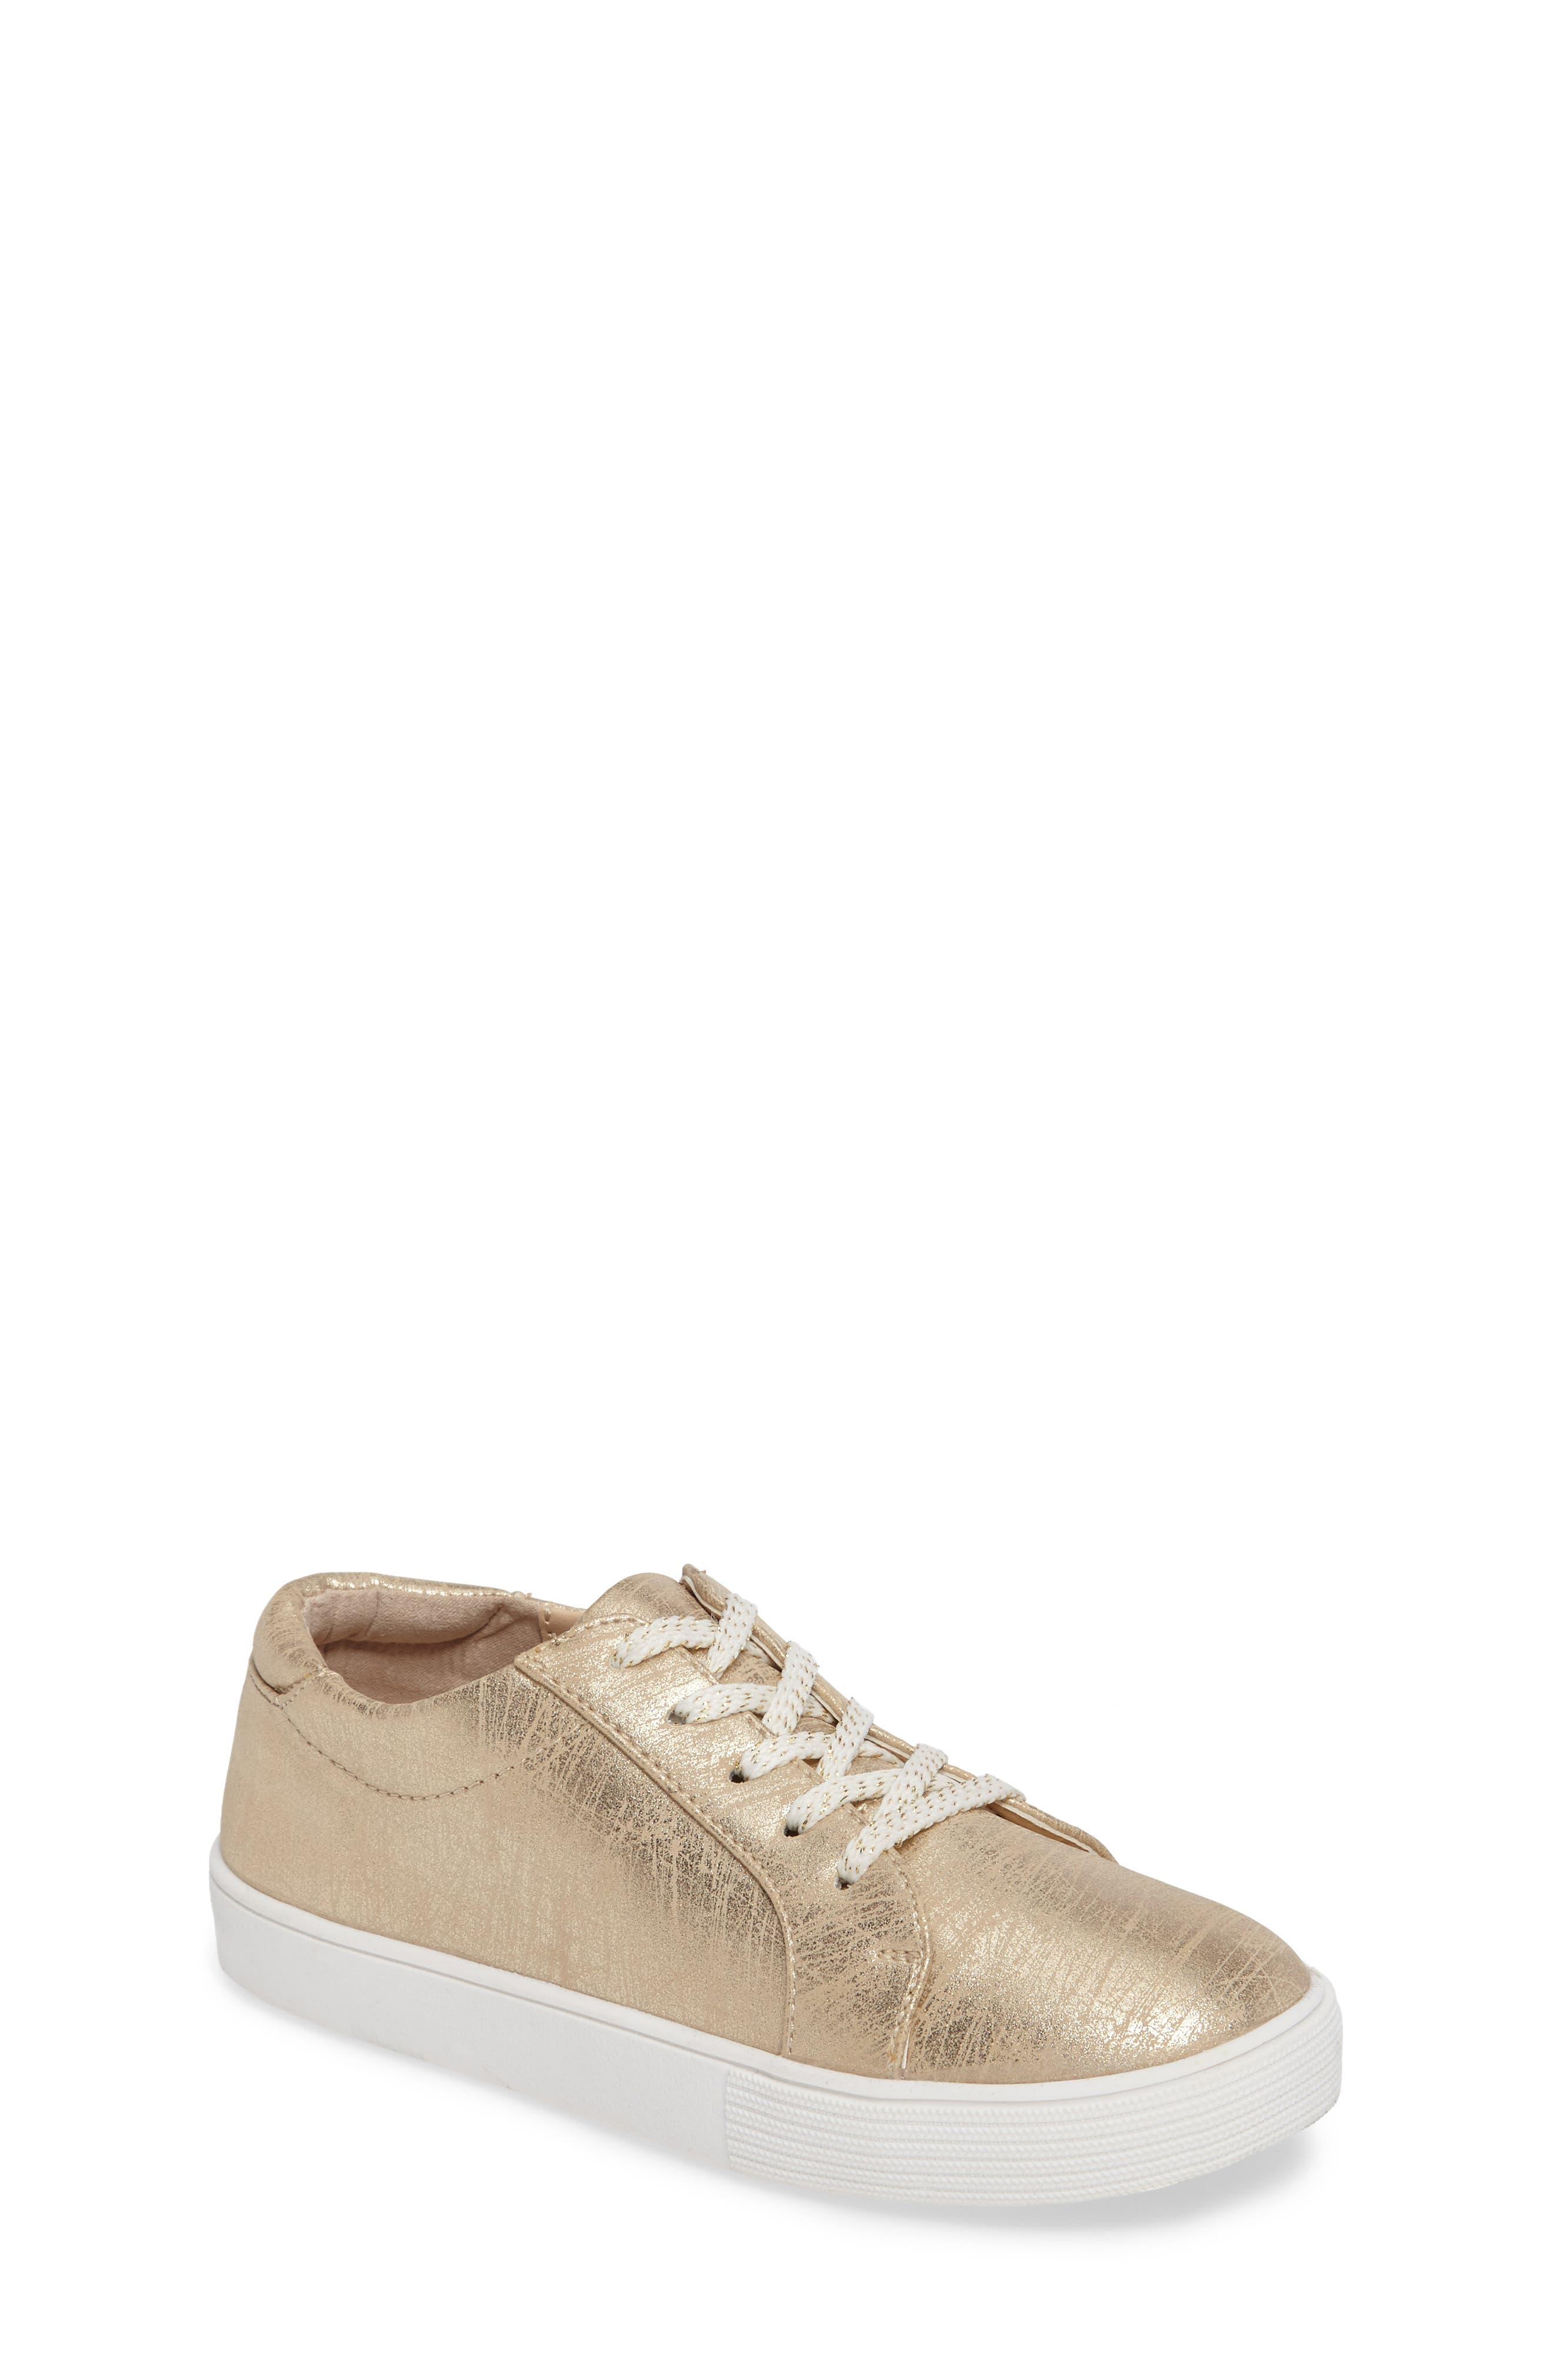 Kenneth Cole New York Kam Elastic Sneaker (Toddler, Little Kid & Big Kid)